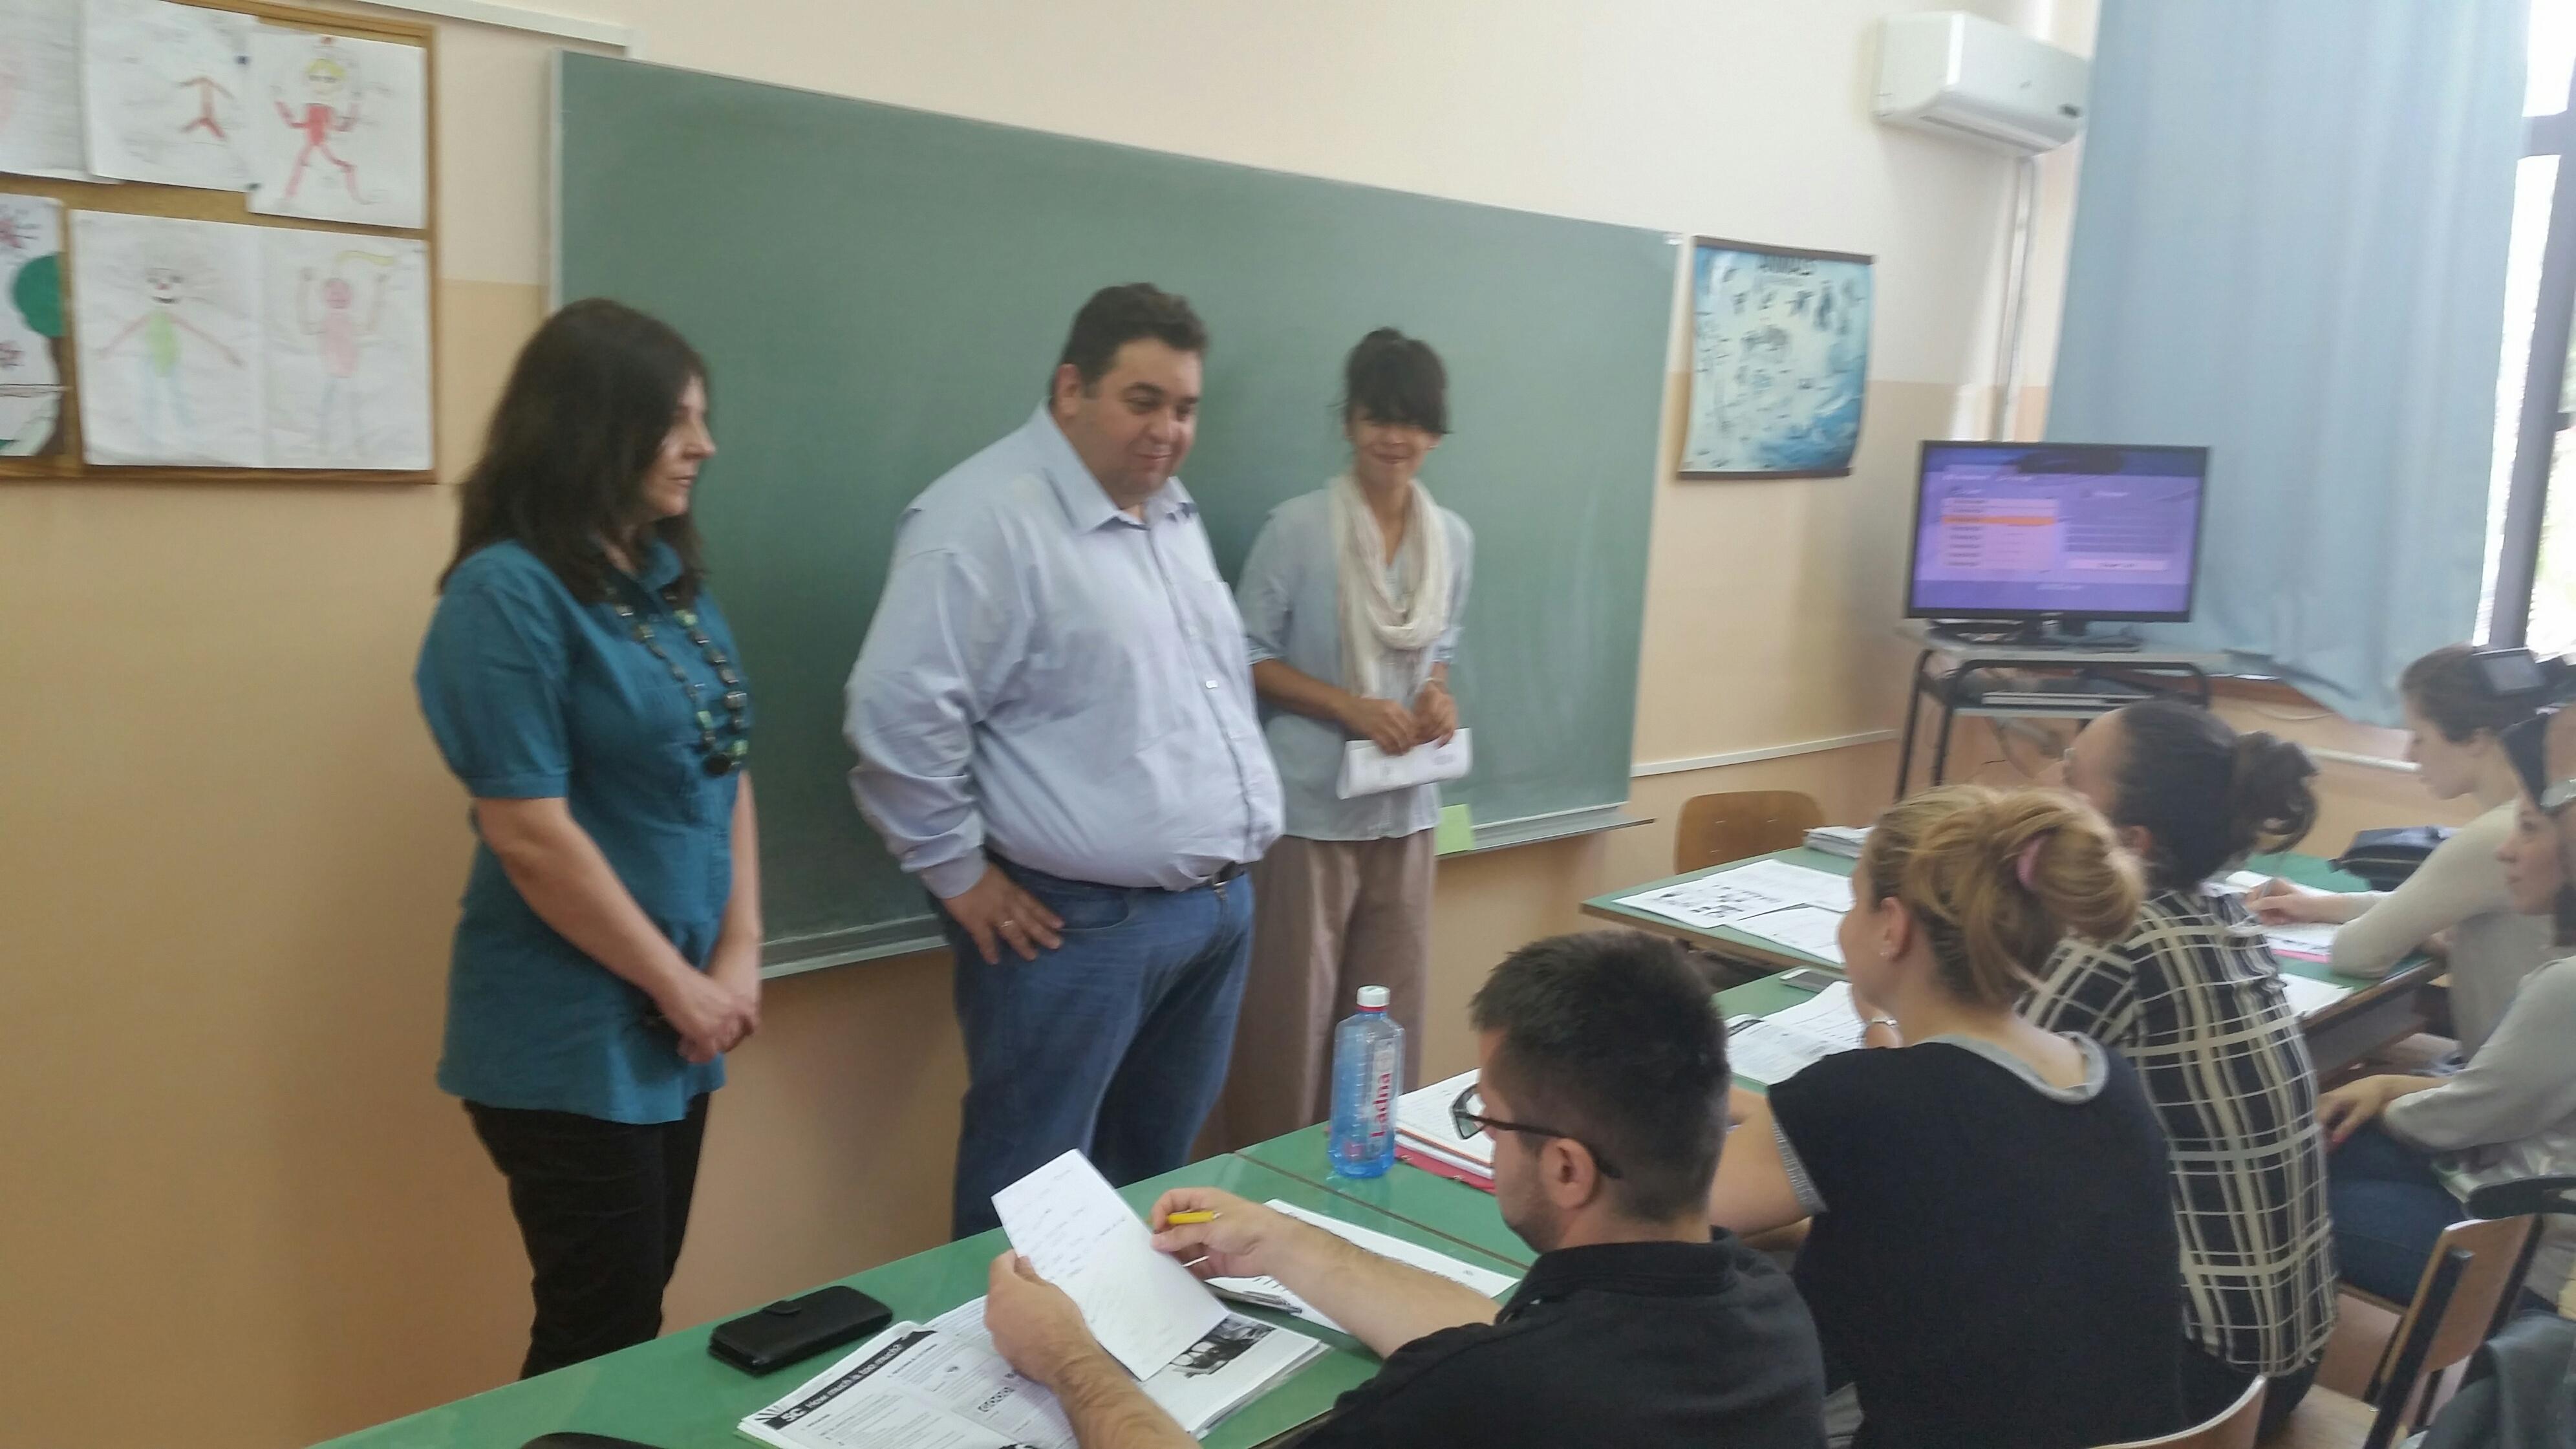 Поповски: Младите до 29 години да аплицираат за обуките за основни вештини